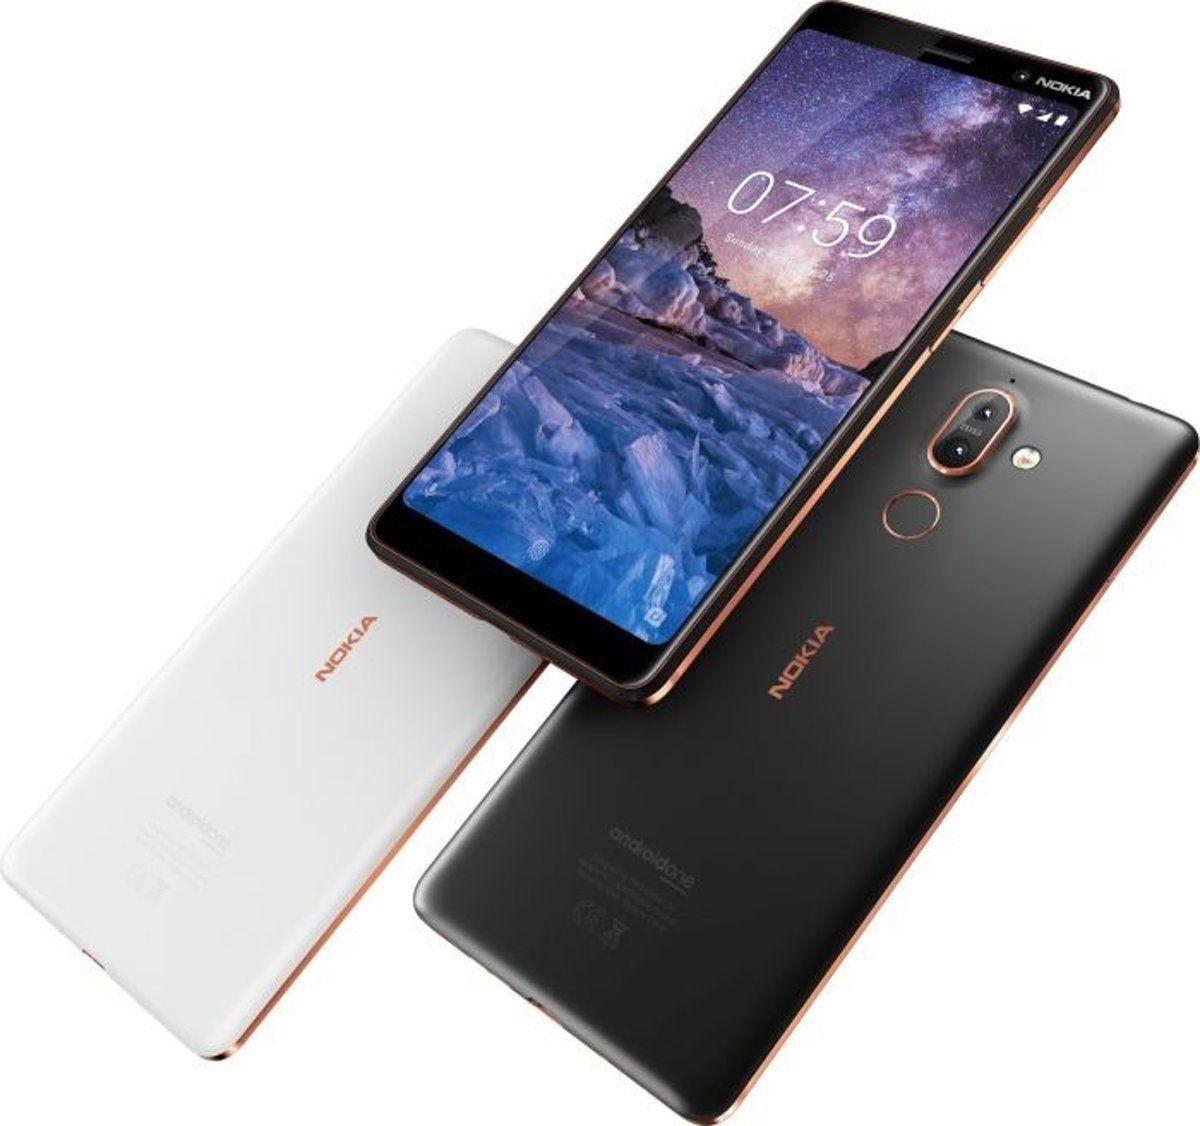 Смартфон Nokia 7.1 Plus (Nokia X7) — достойная новинка